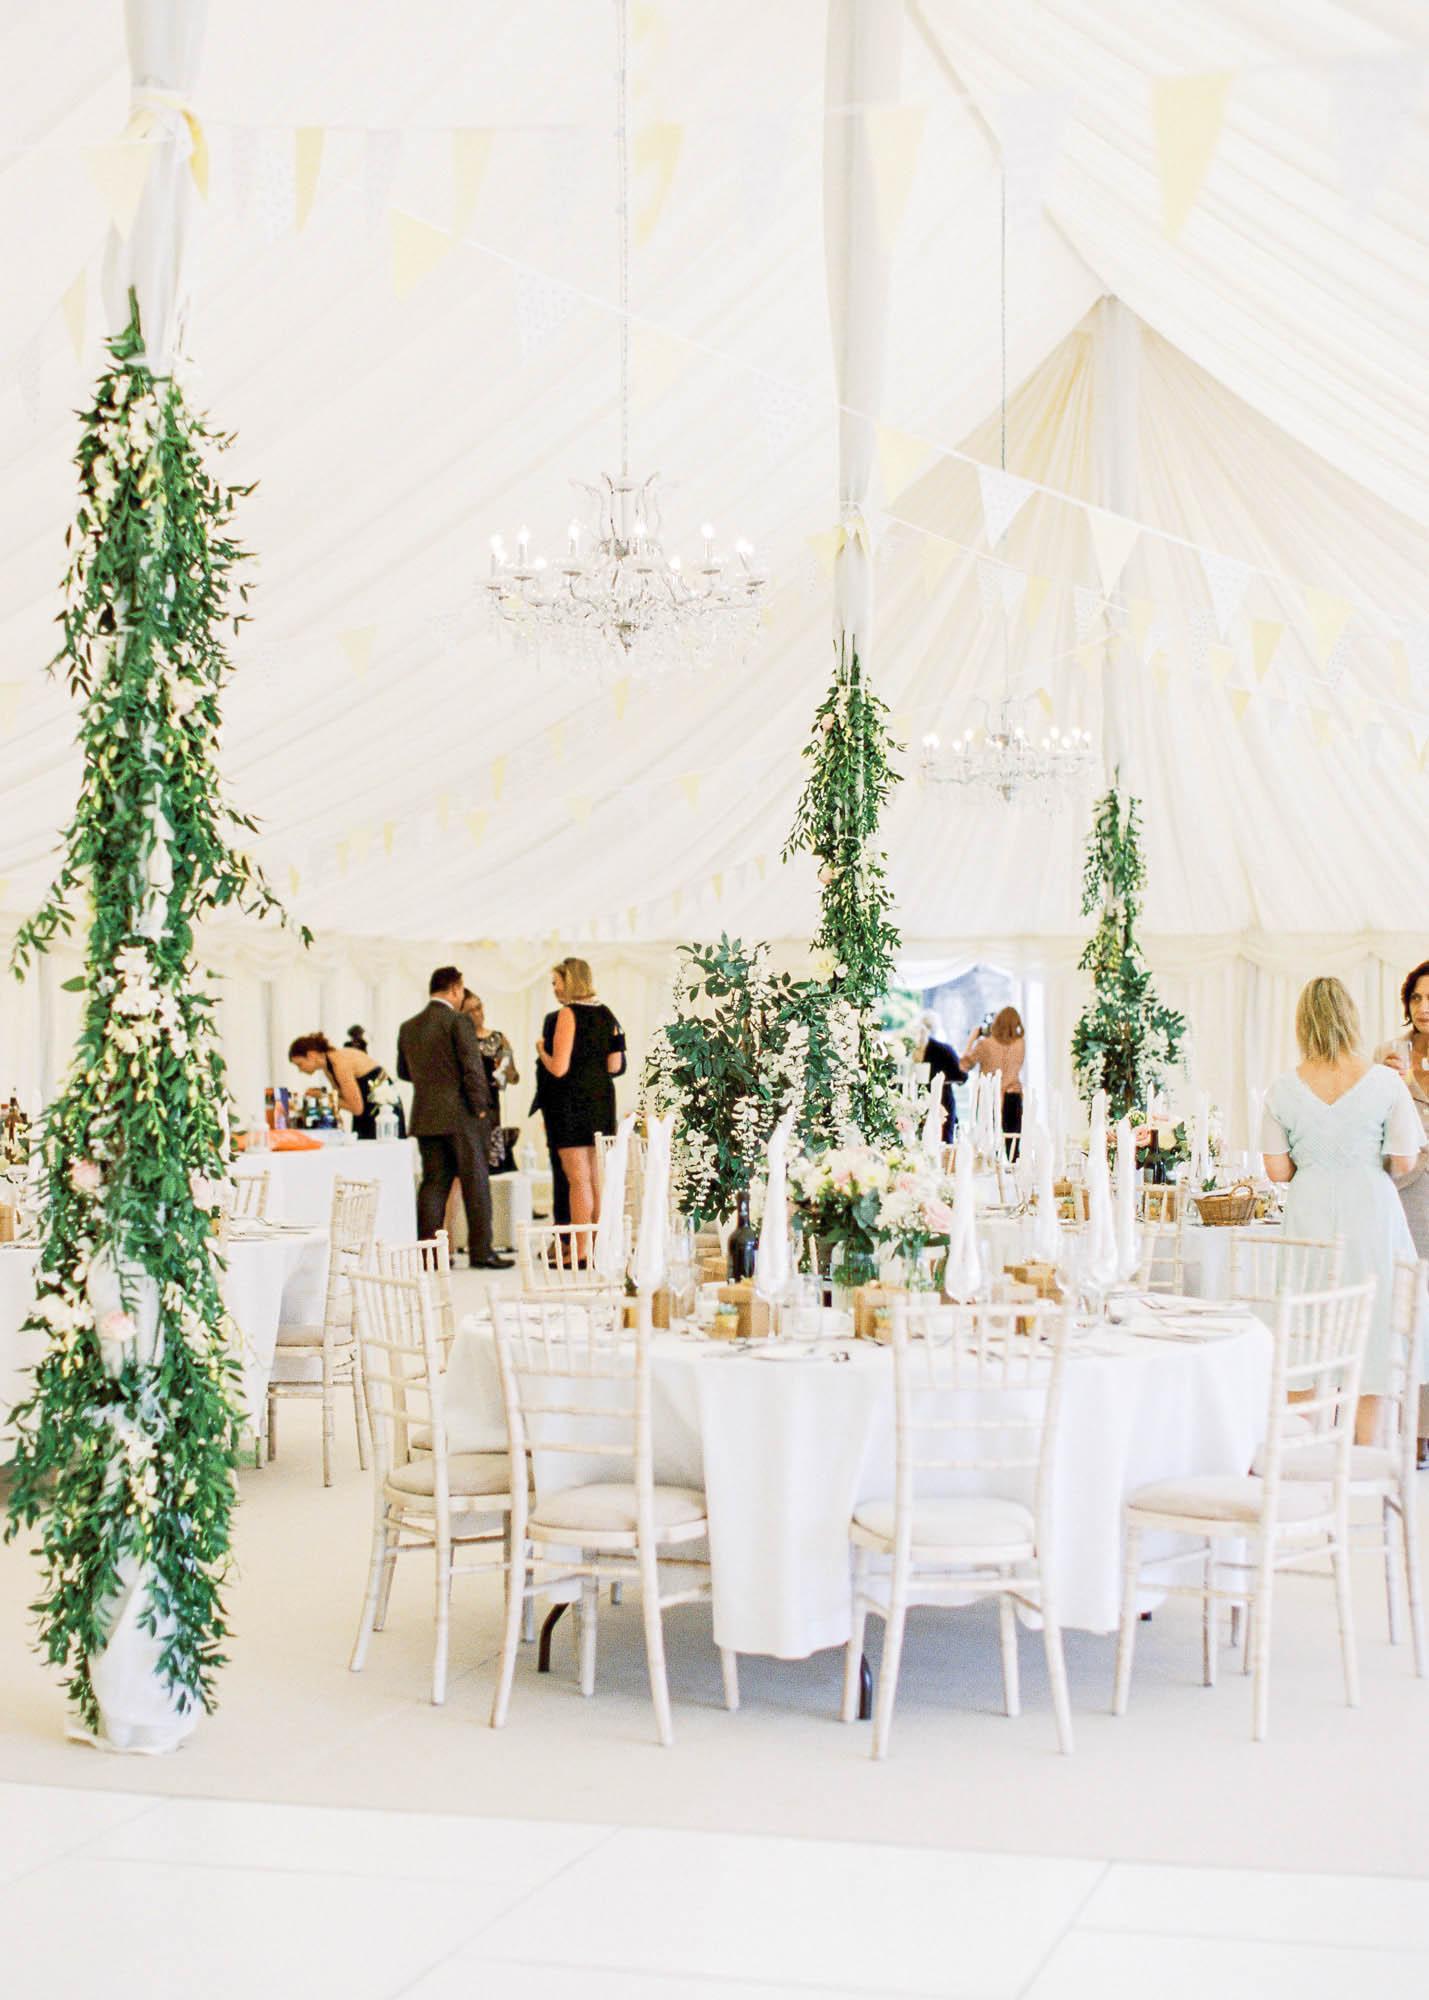 Amy O'Boyle Photography- Destination & UK Fine Art Film Wedding Photographer- Brickendonbury Estate Wedding-32.jpg